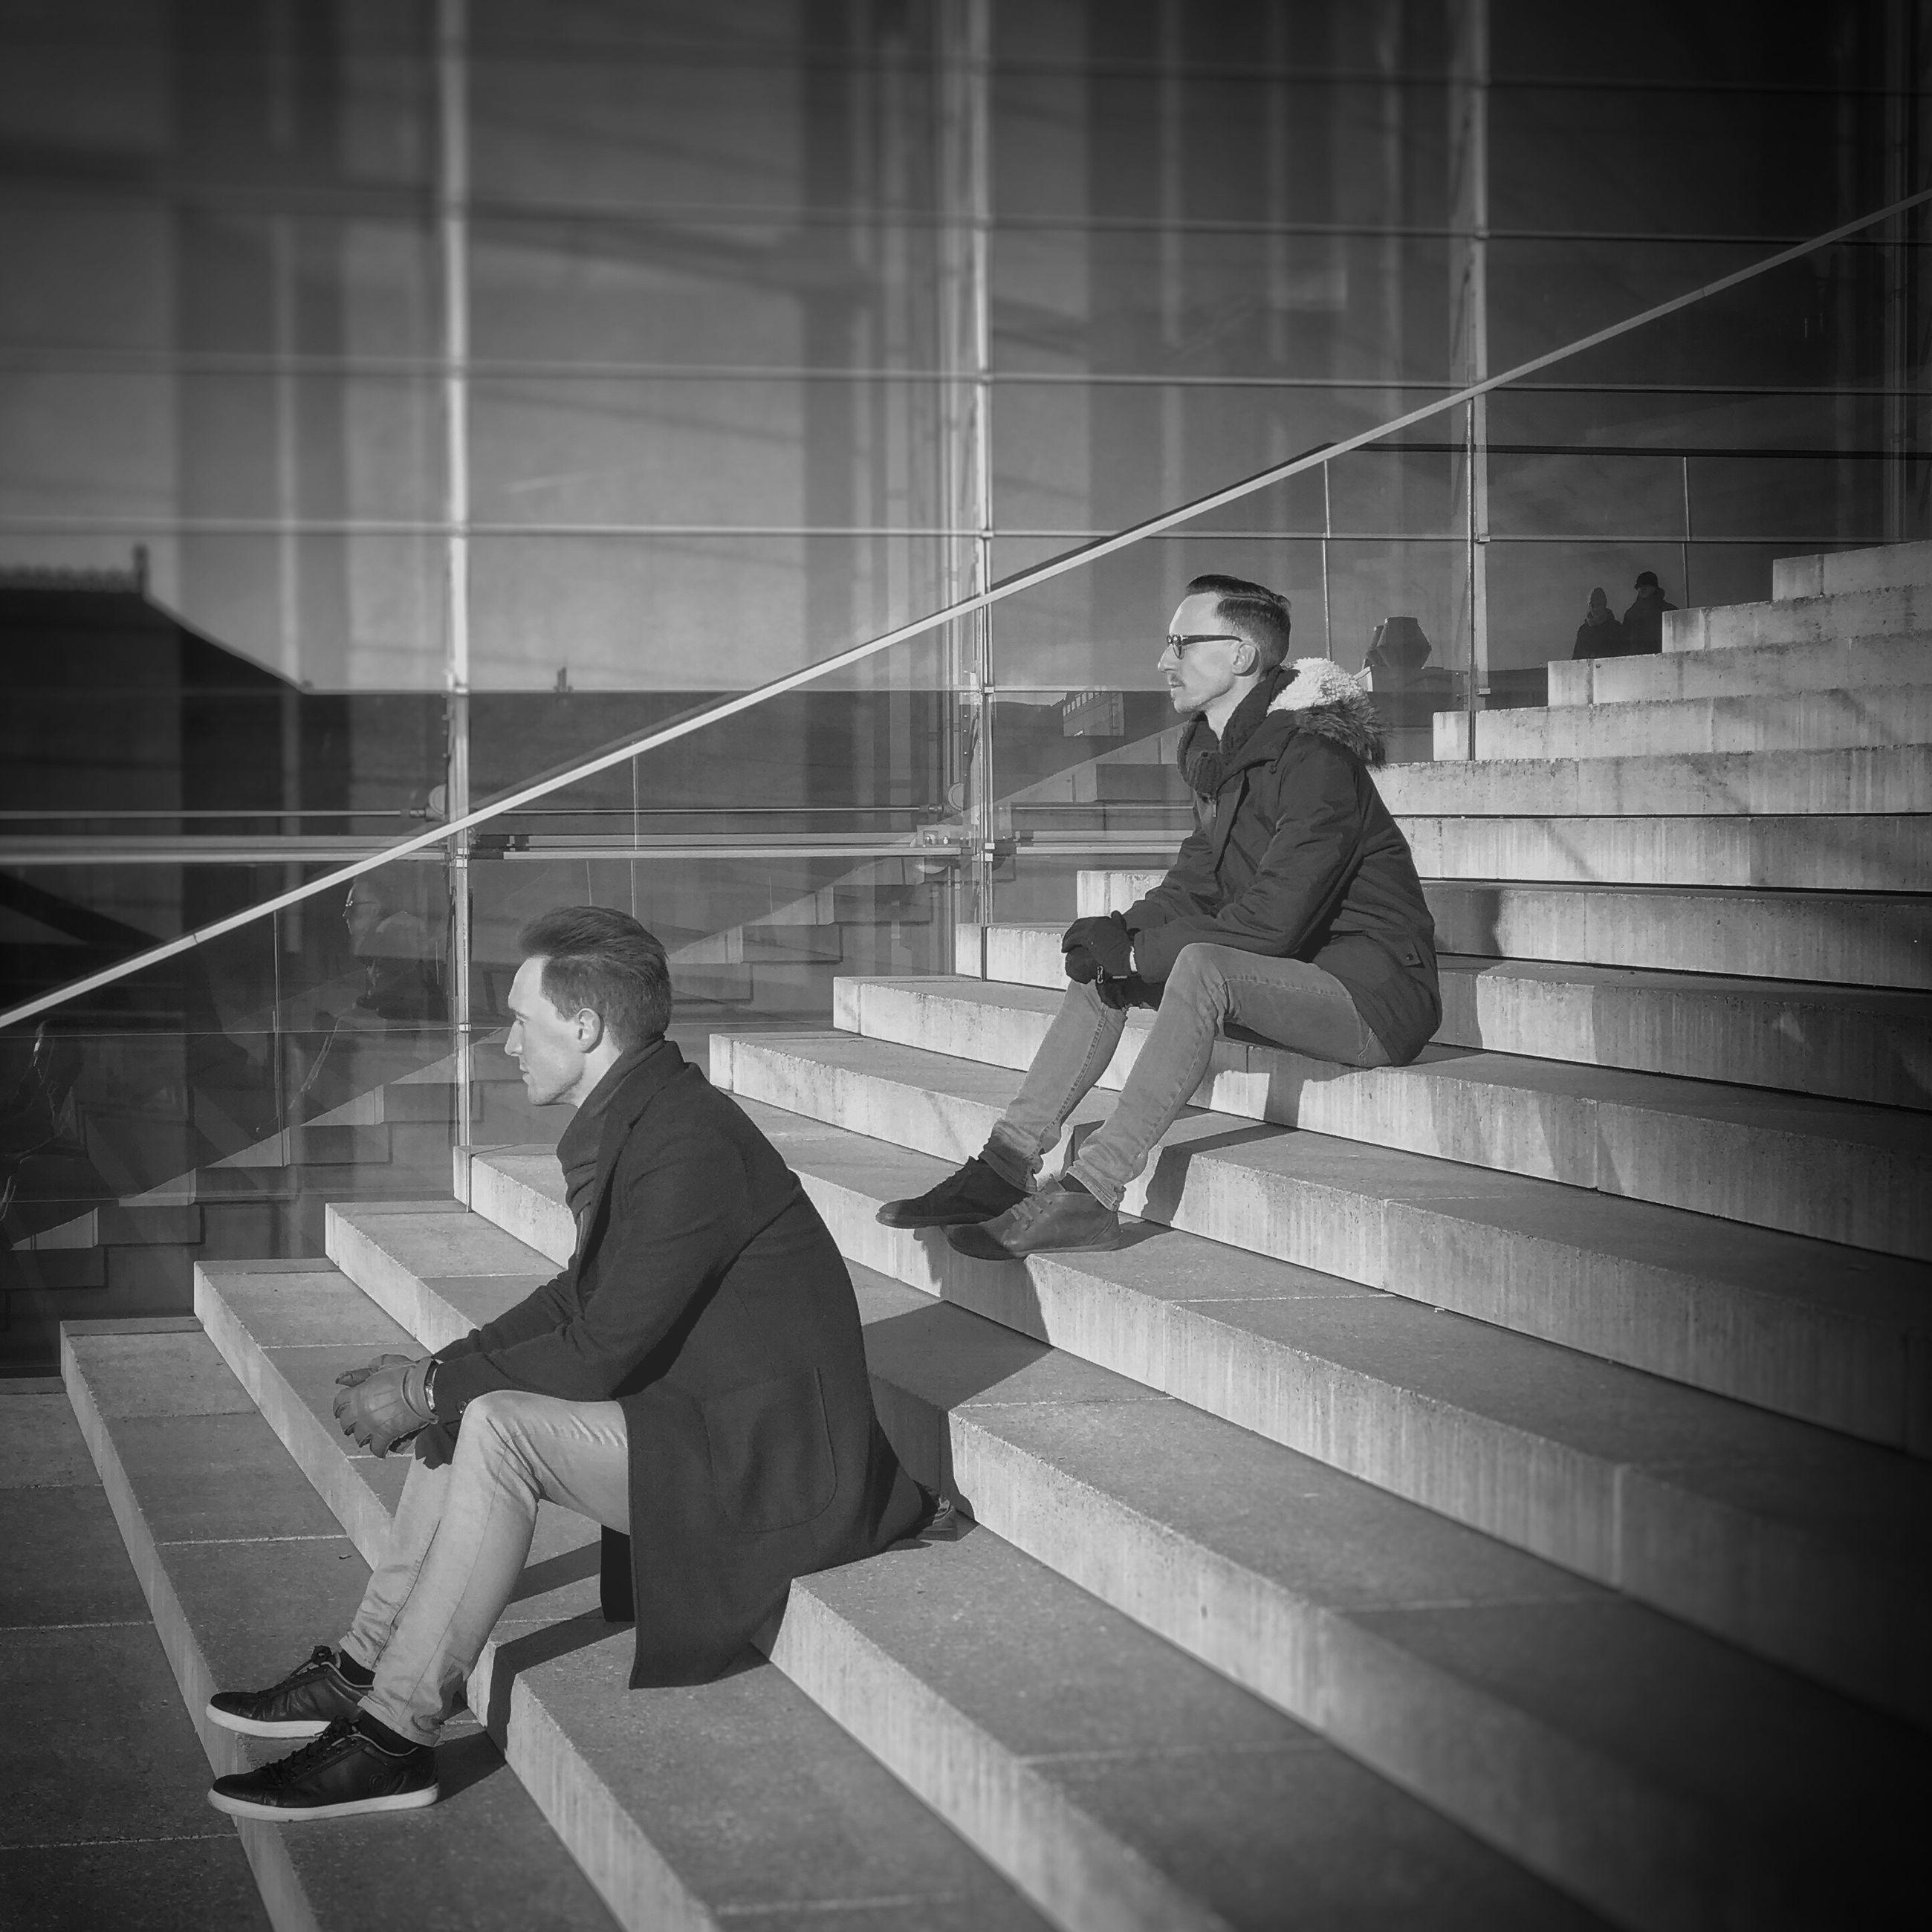 Fashionable men sitting on steps against modern building